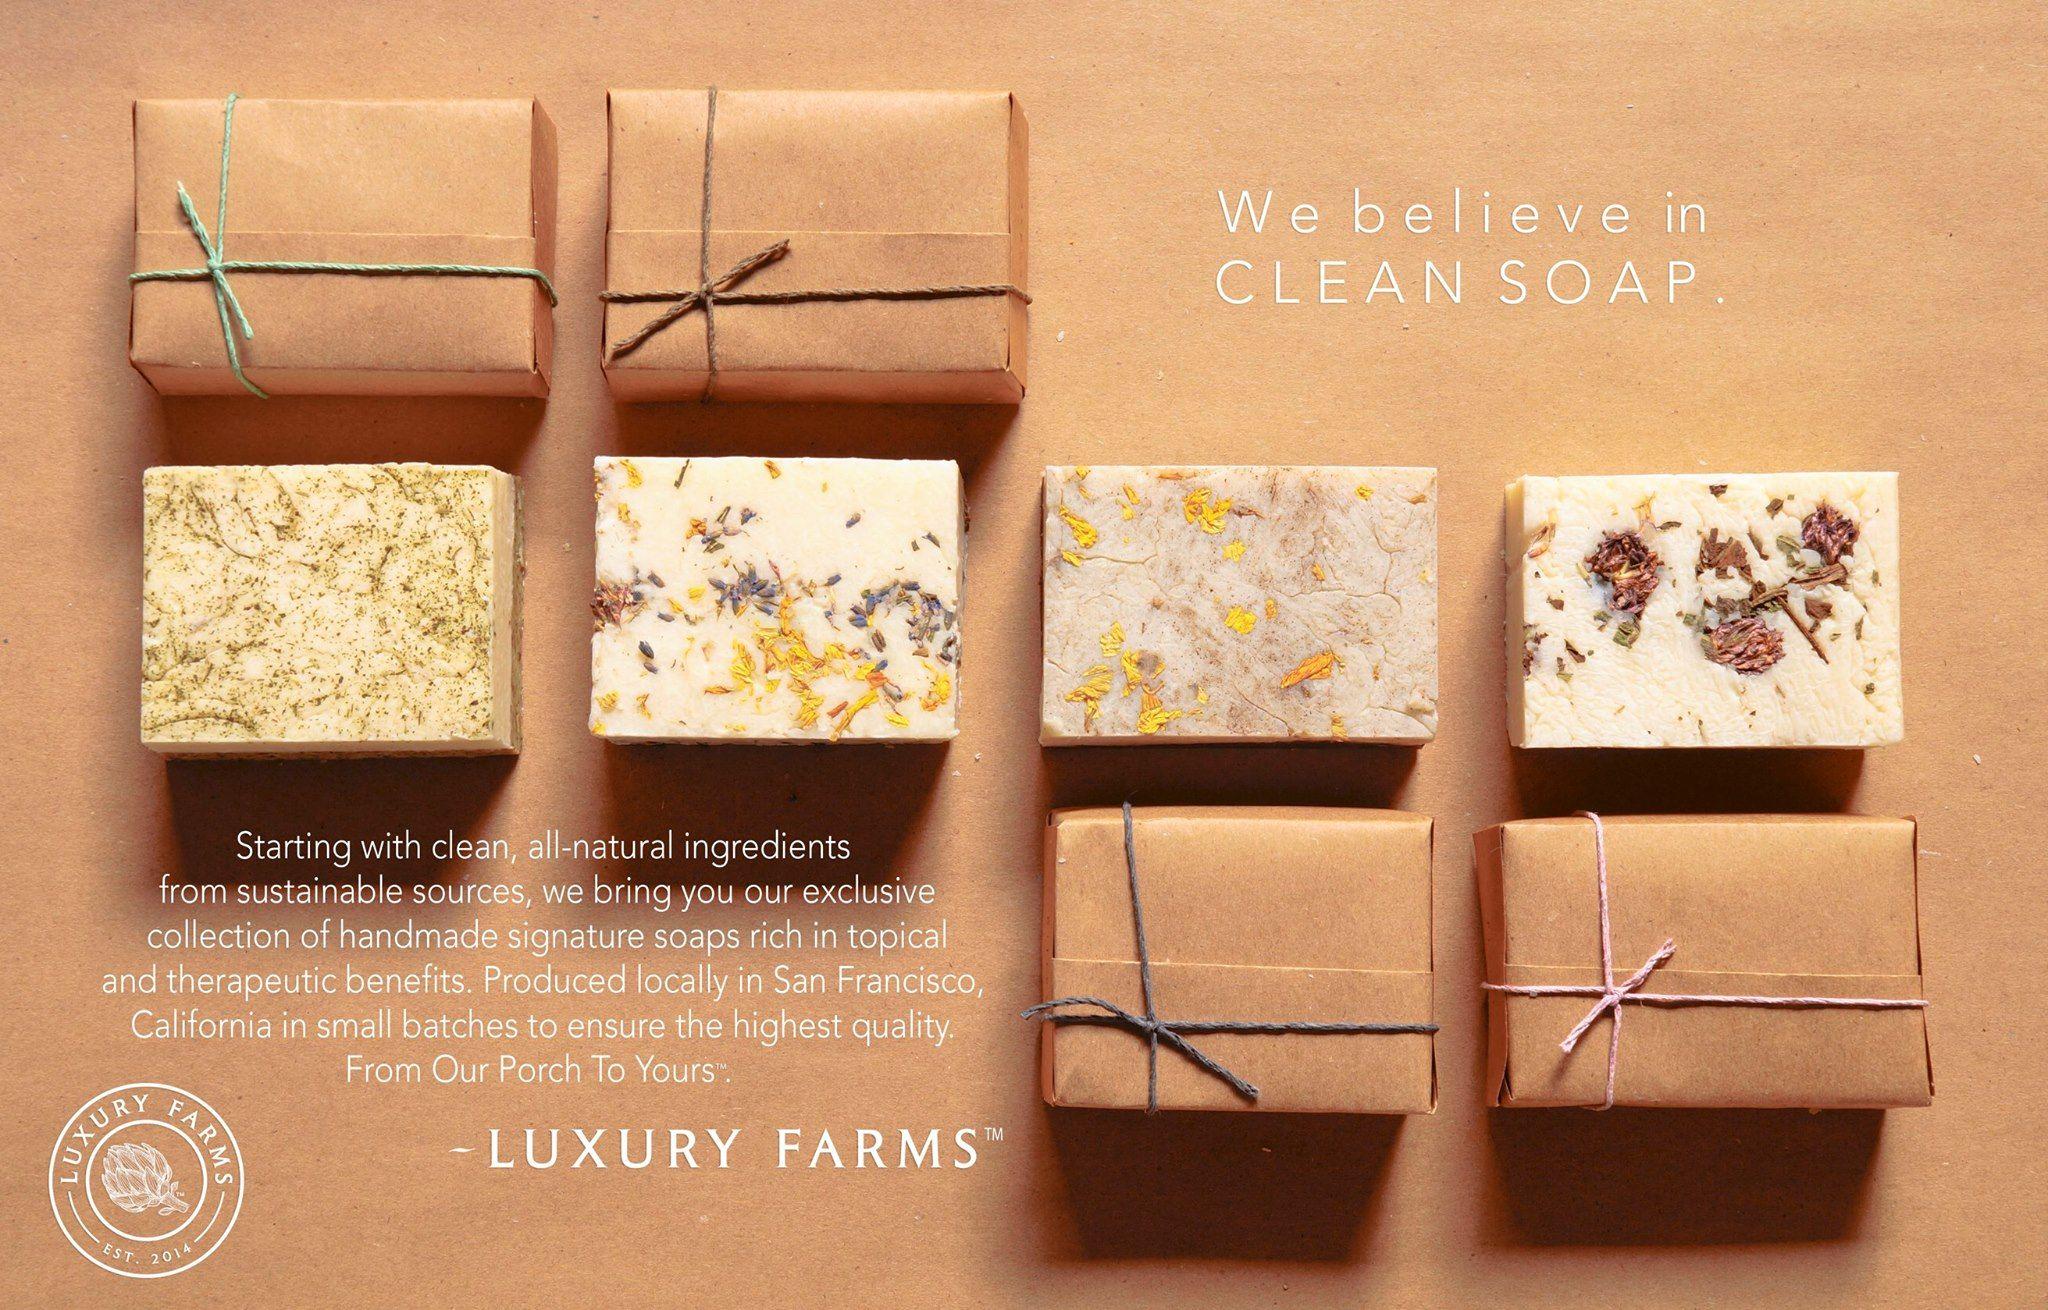 must have soaps... www.luxuryfarms.com